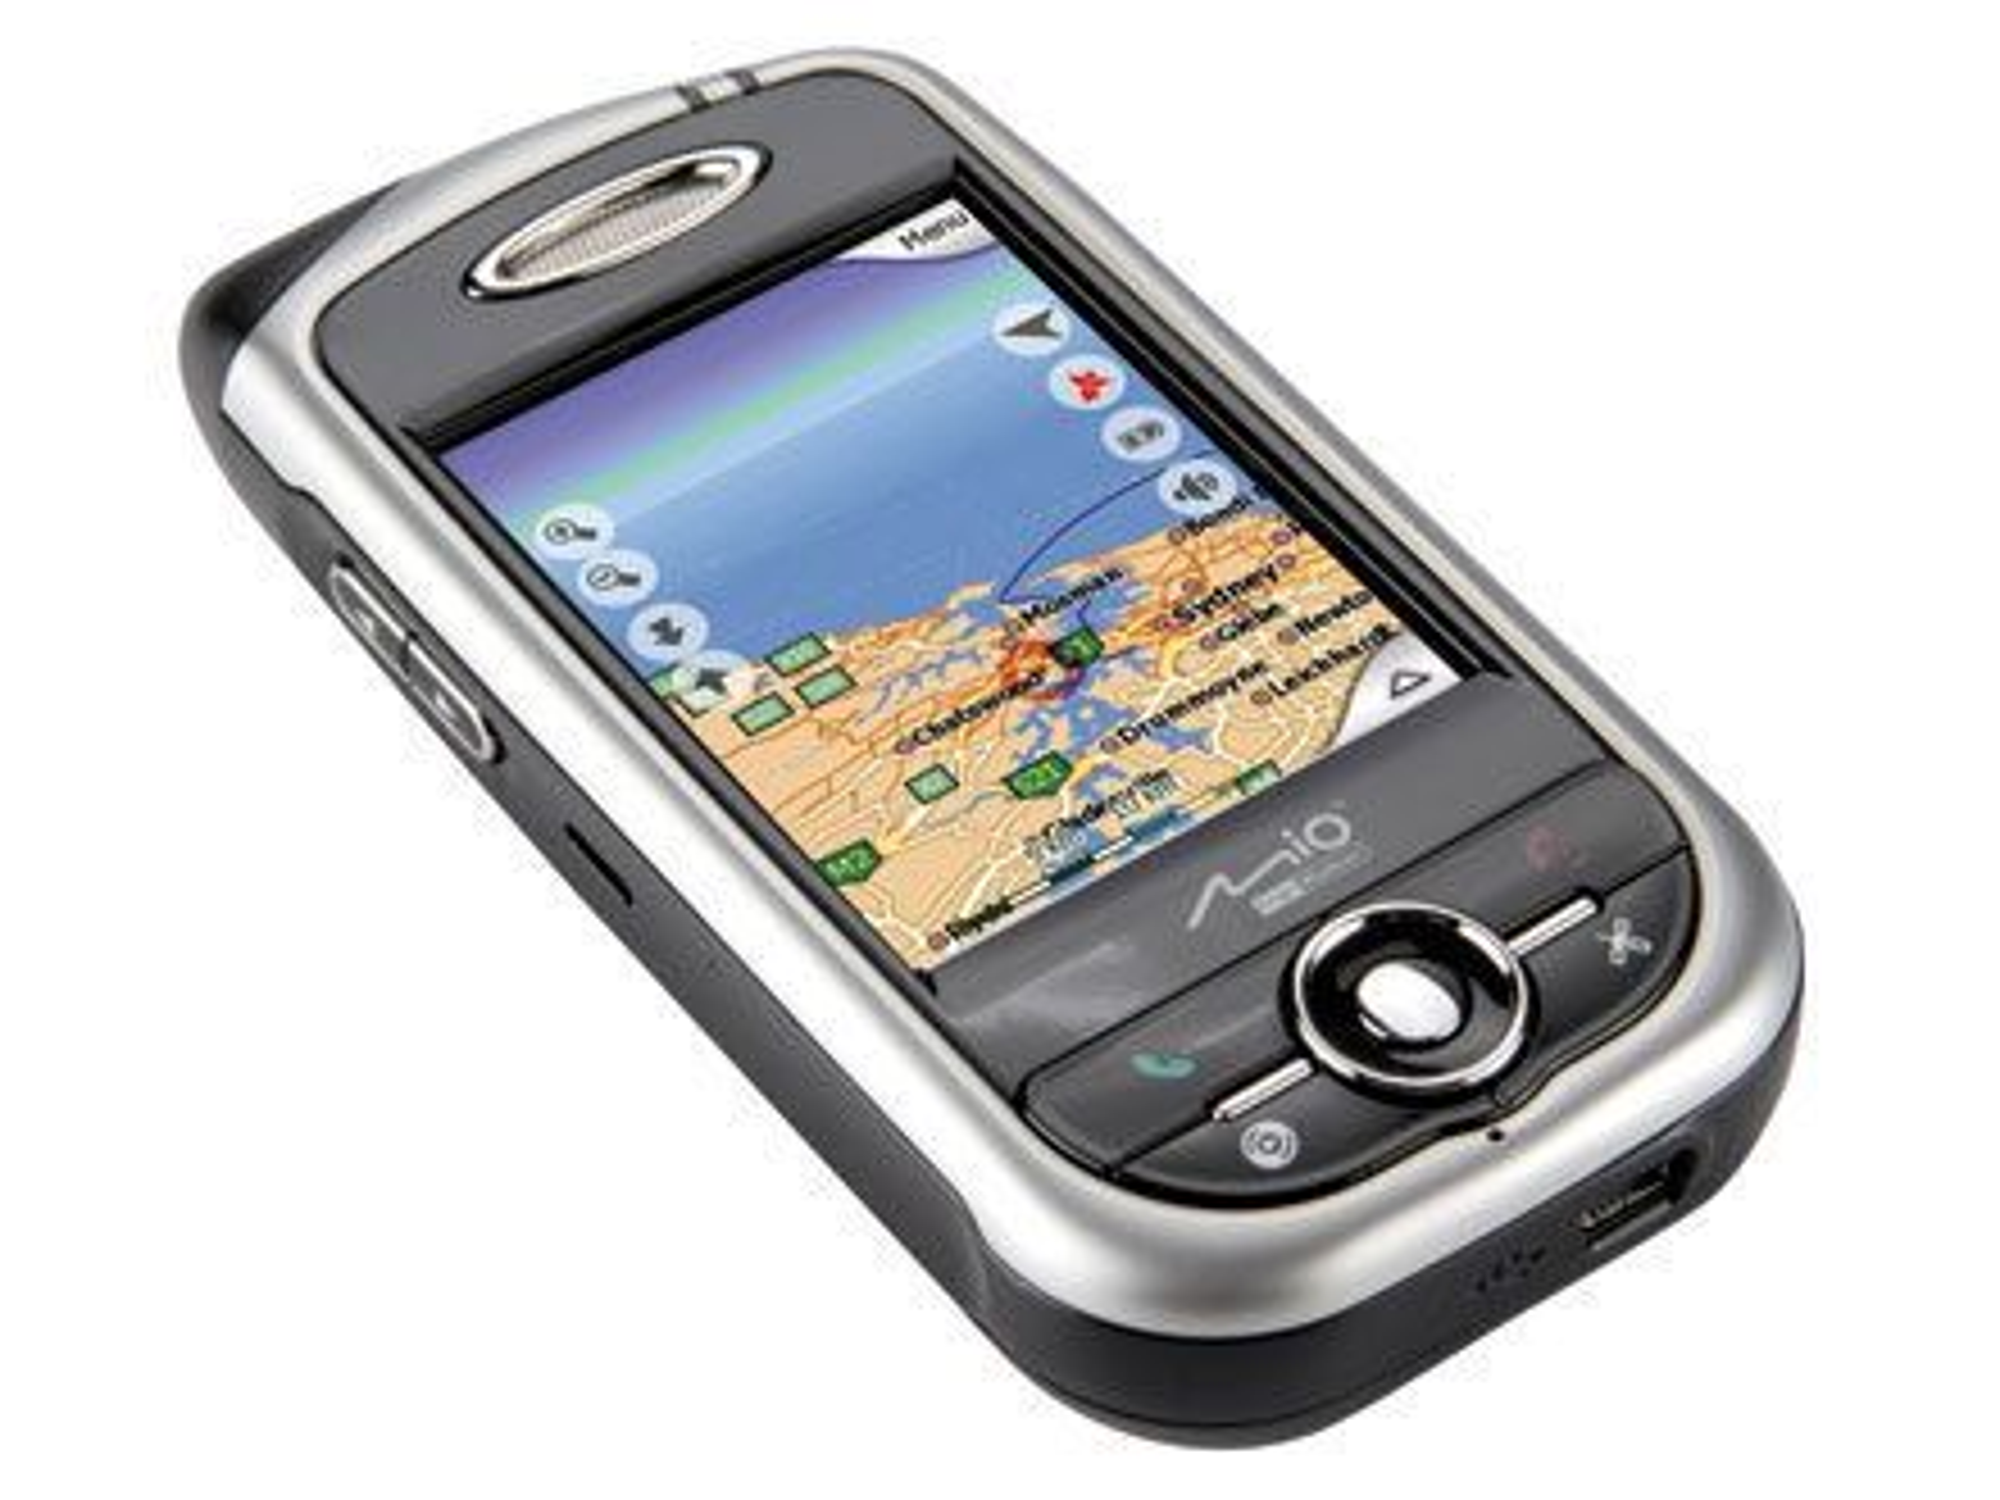 Mia A701 - mobiltelefon med blant annet GPS.